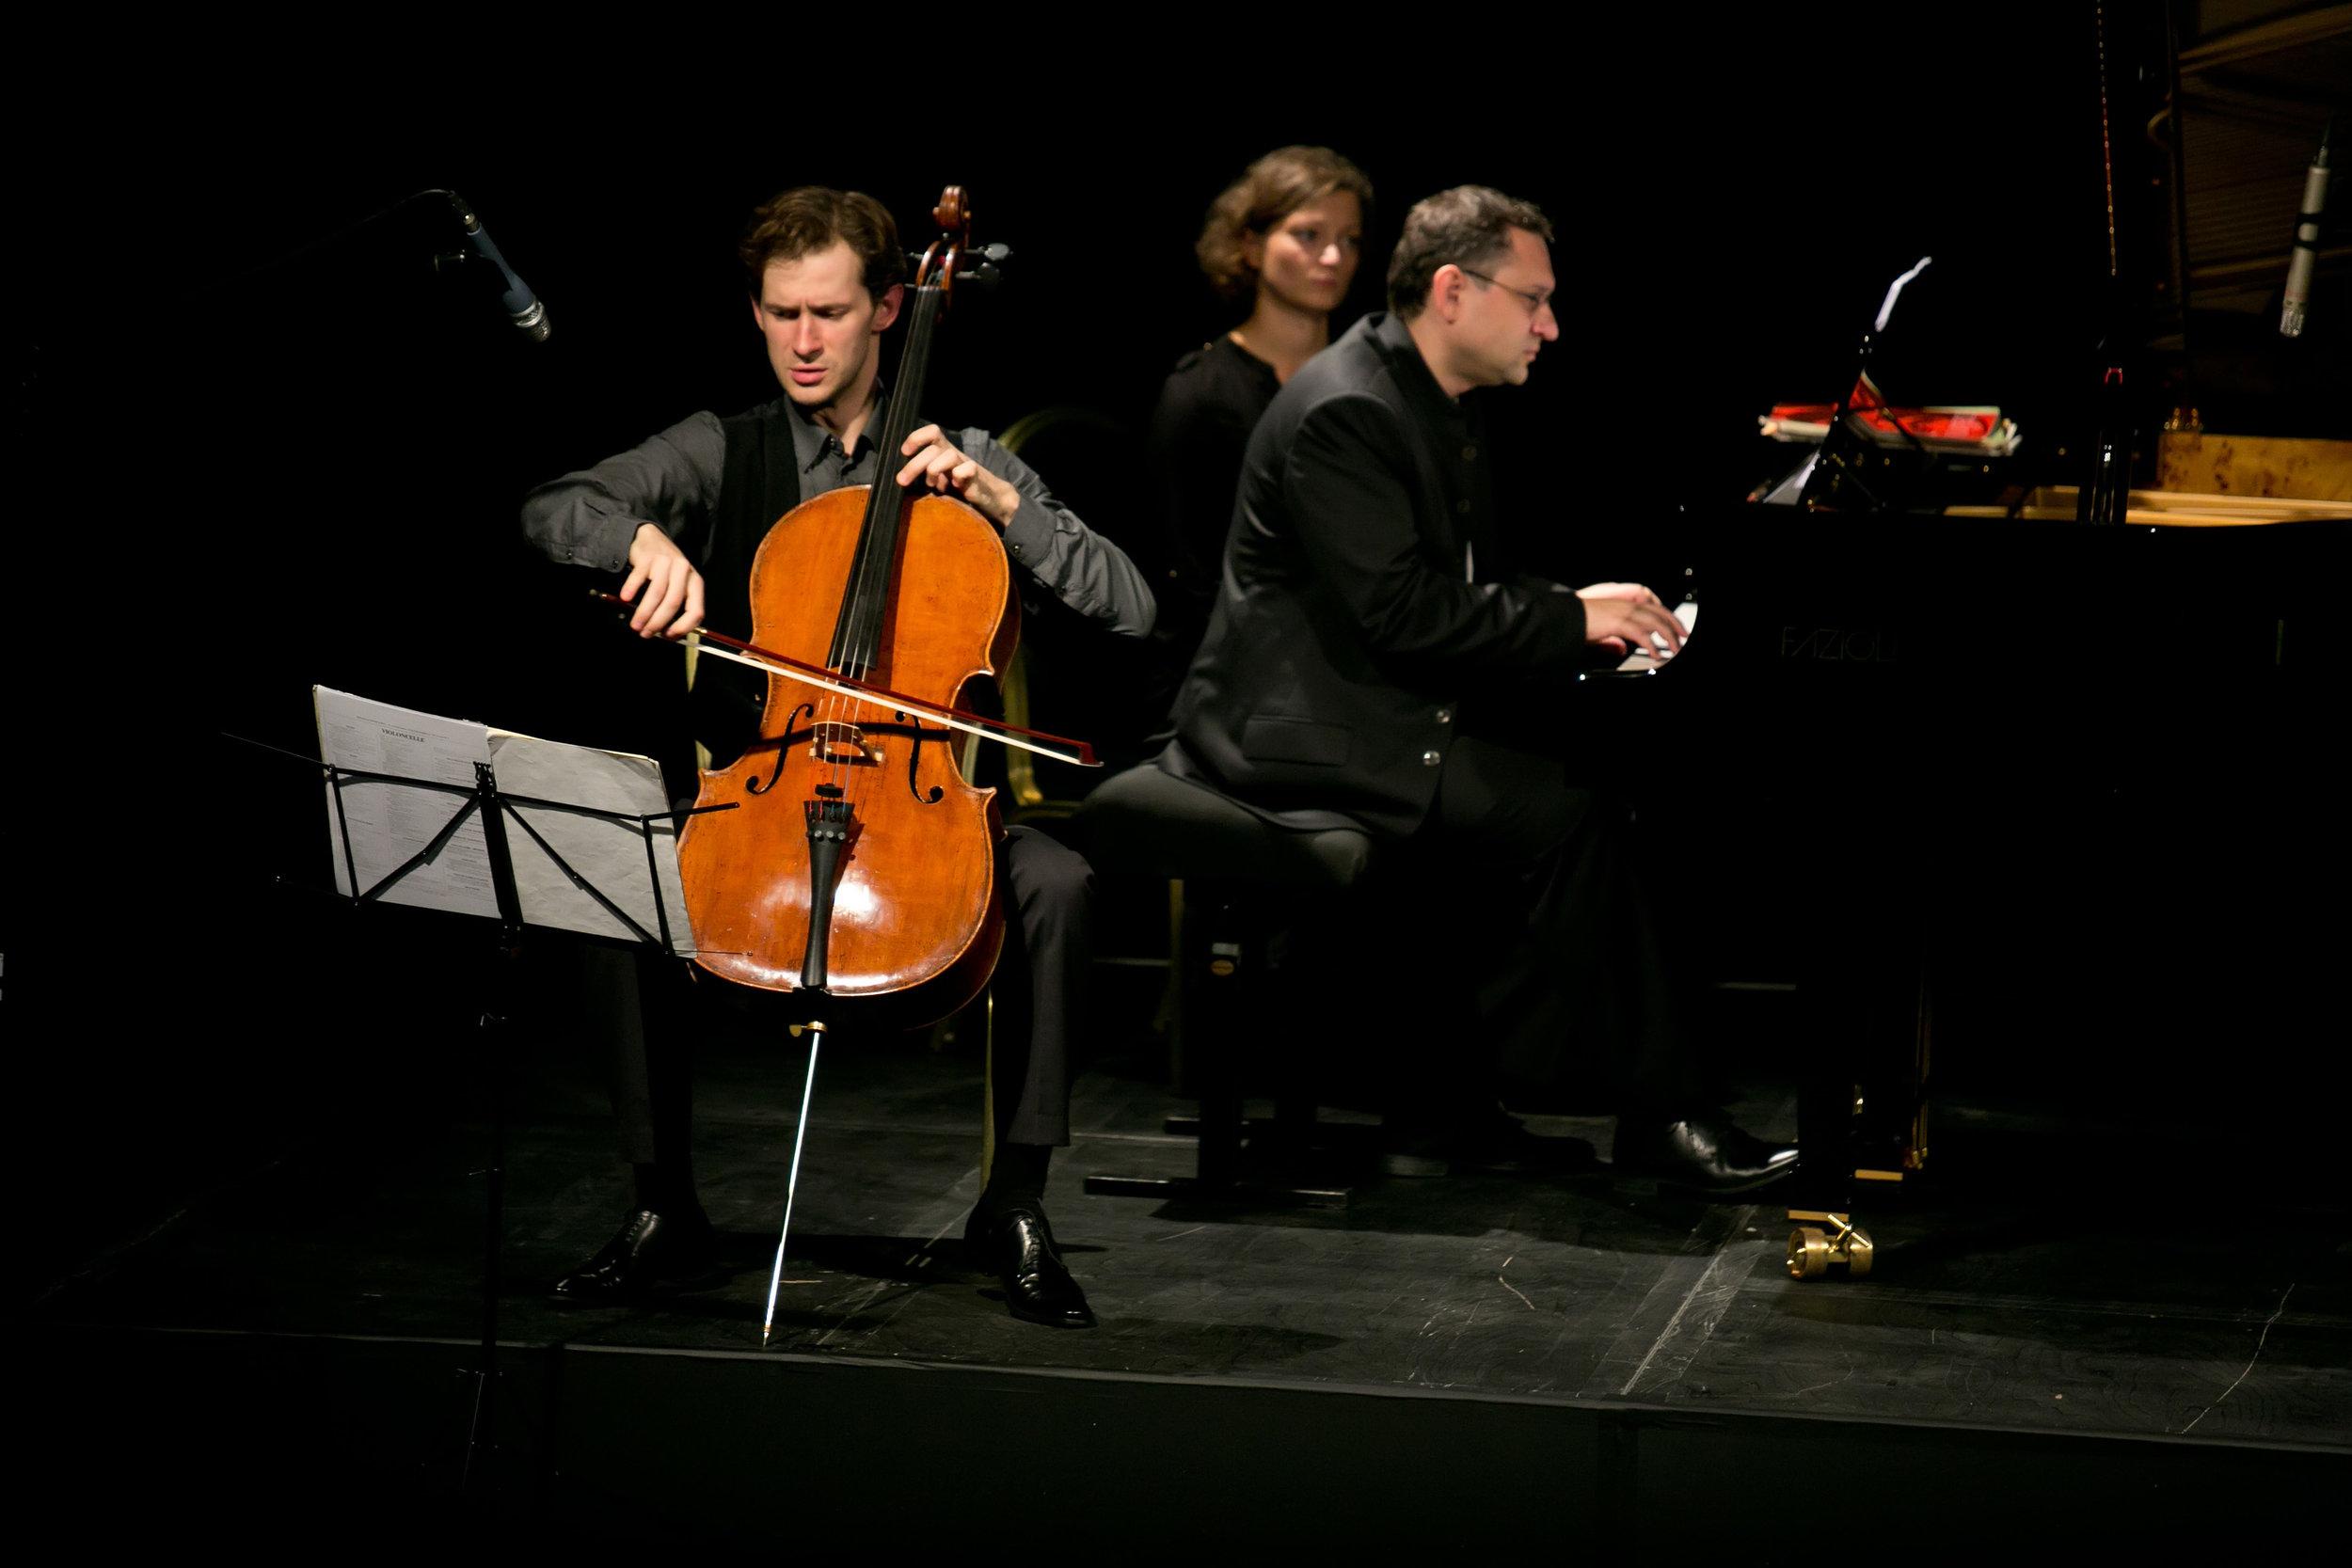 MISIA: THE MUSE OF BELLE EPOQUE - sEPTEMBER 21, 2013. 20TH CENTURY THEATER, londonAleksei Kiseliov, celloVsevolod Dvorkin, pianoIllustrated talk by Patrick BadeGabriel Fauré - Romance, Op. 69; Élégie, Op. 24; Papillon, Op. 77Claude Debussy - Nocturne et Scherzo for Cello and Piano; Sonata for Cello and Piano in D minorMaurice Ravel - Le Cygne (arranged for Cello); Pièce en Forme de HabaneraFrancis Poulenc - Cavatine from Sonata for Cello and Piano, Op. 143 Igor Stravinsky - Suite Italienne (after Pulcinella) for Cello and Piano